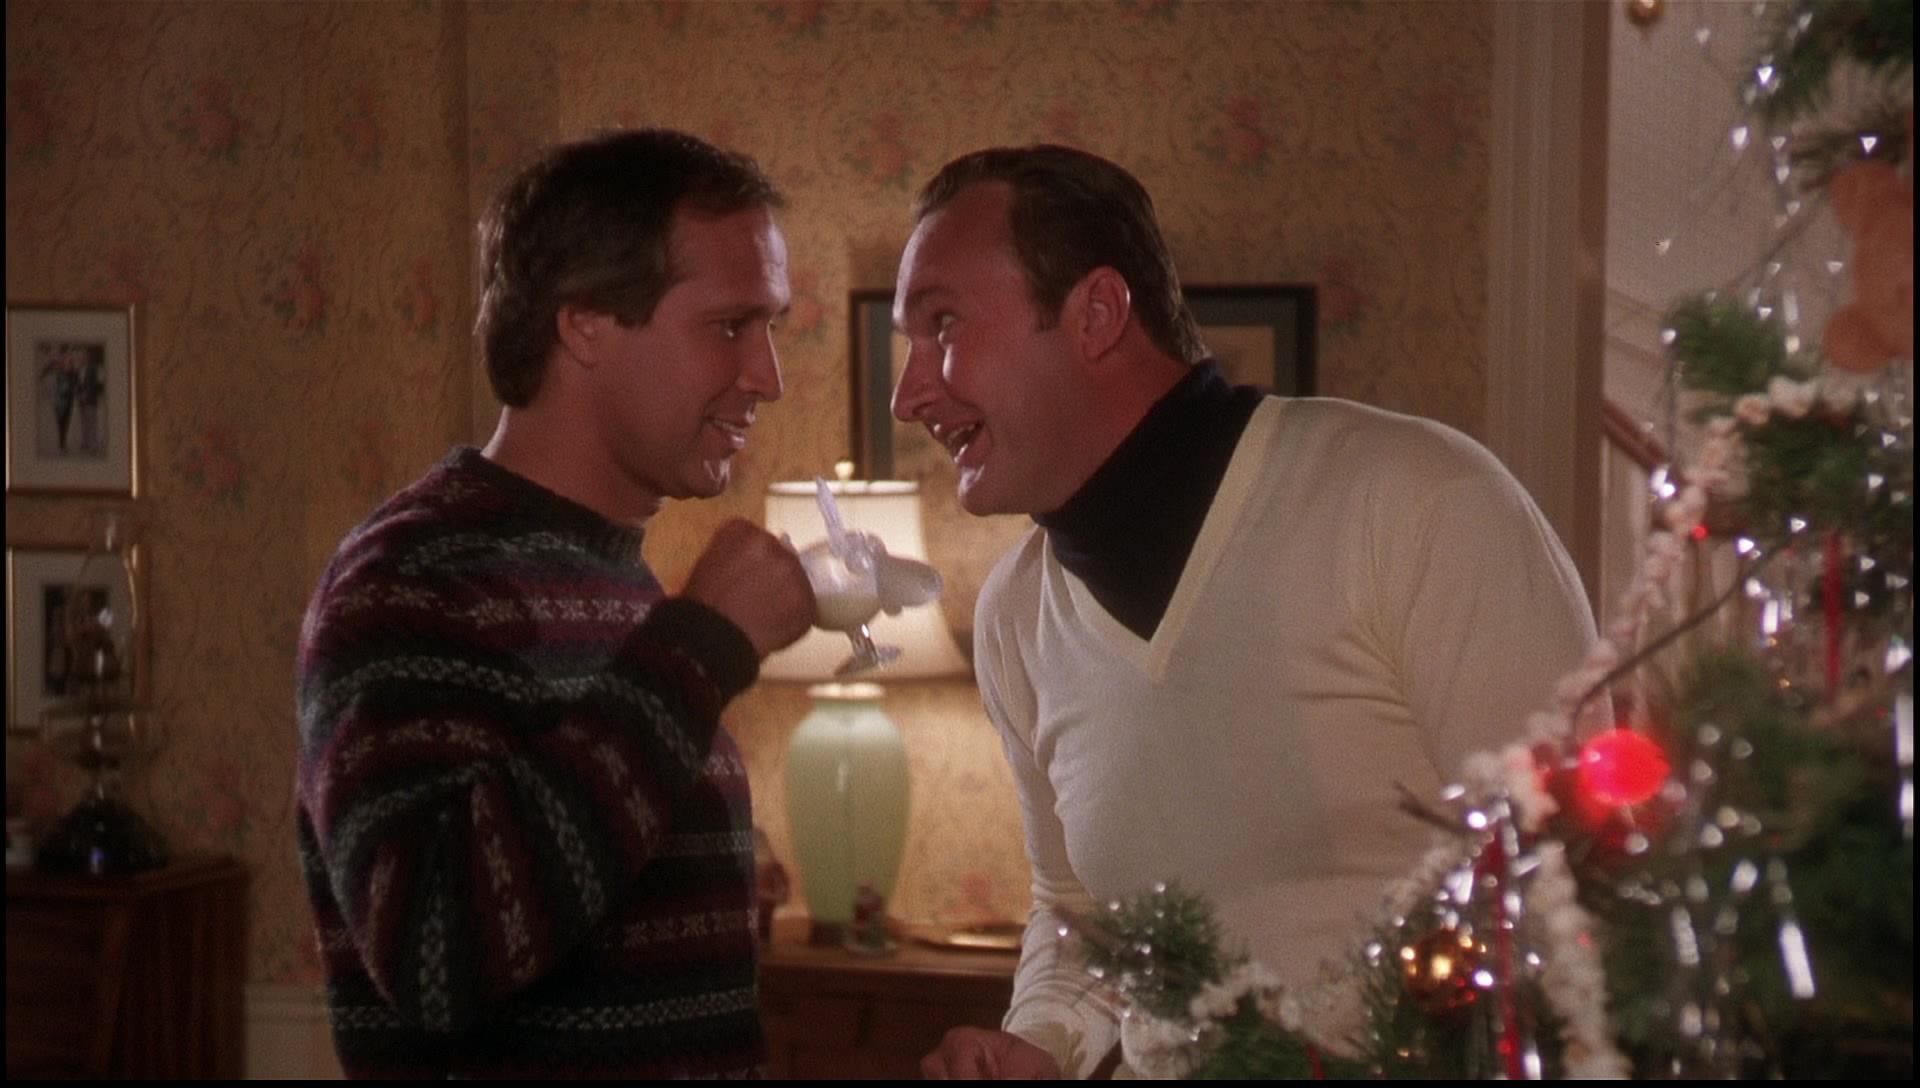 National-Lampoons-Christmas-Vacation-Eggnog